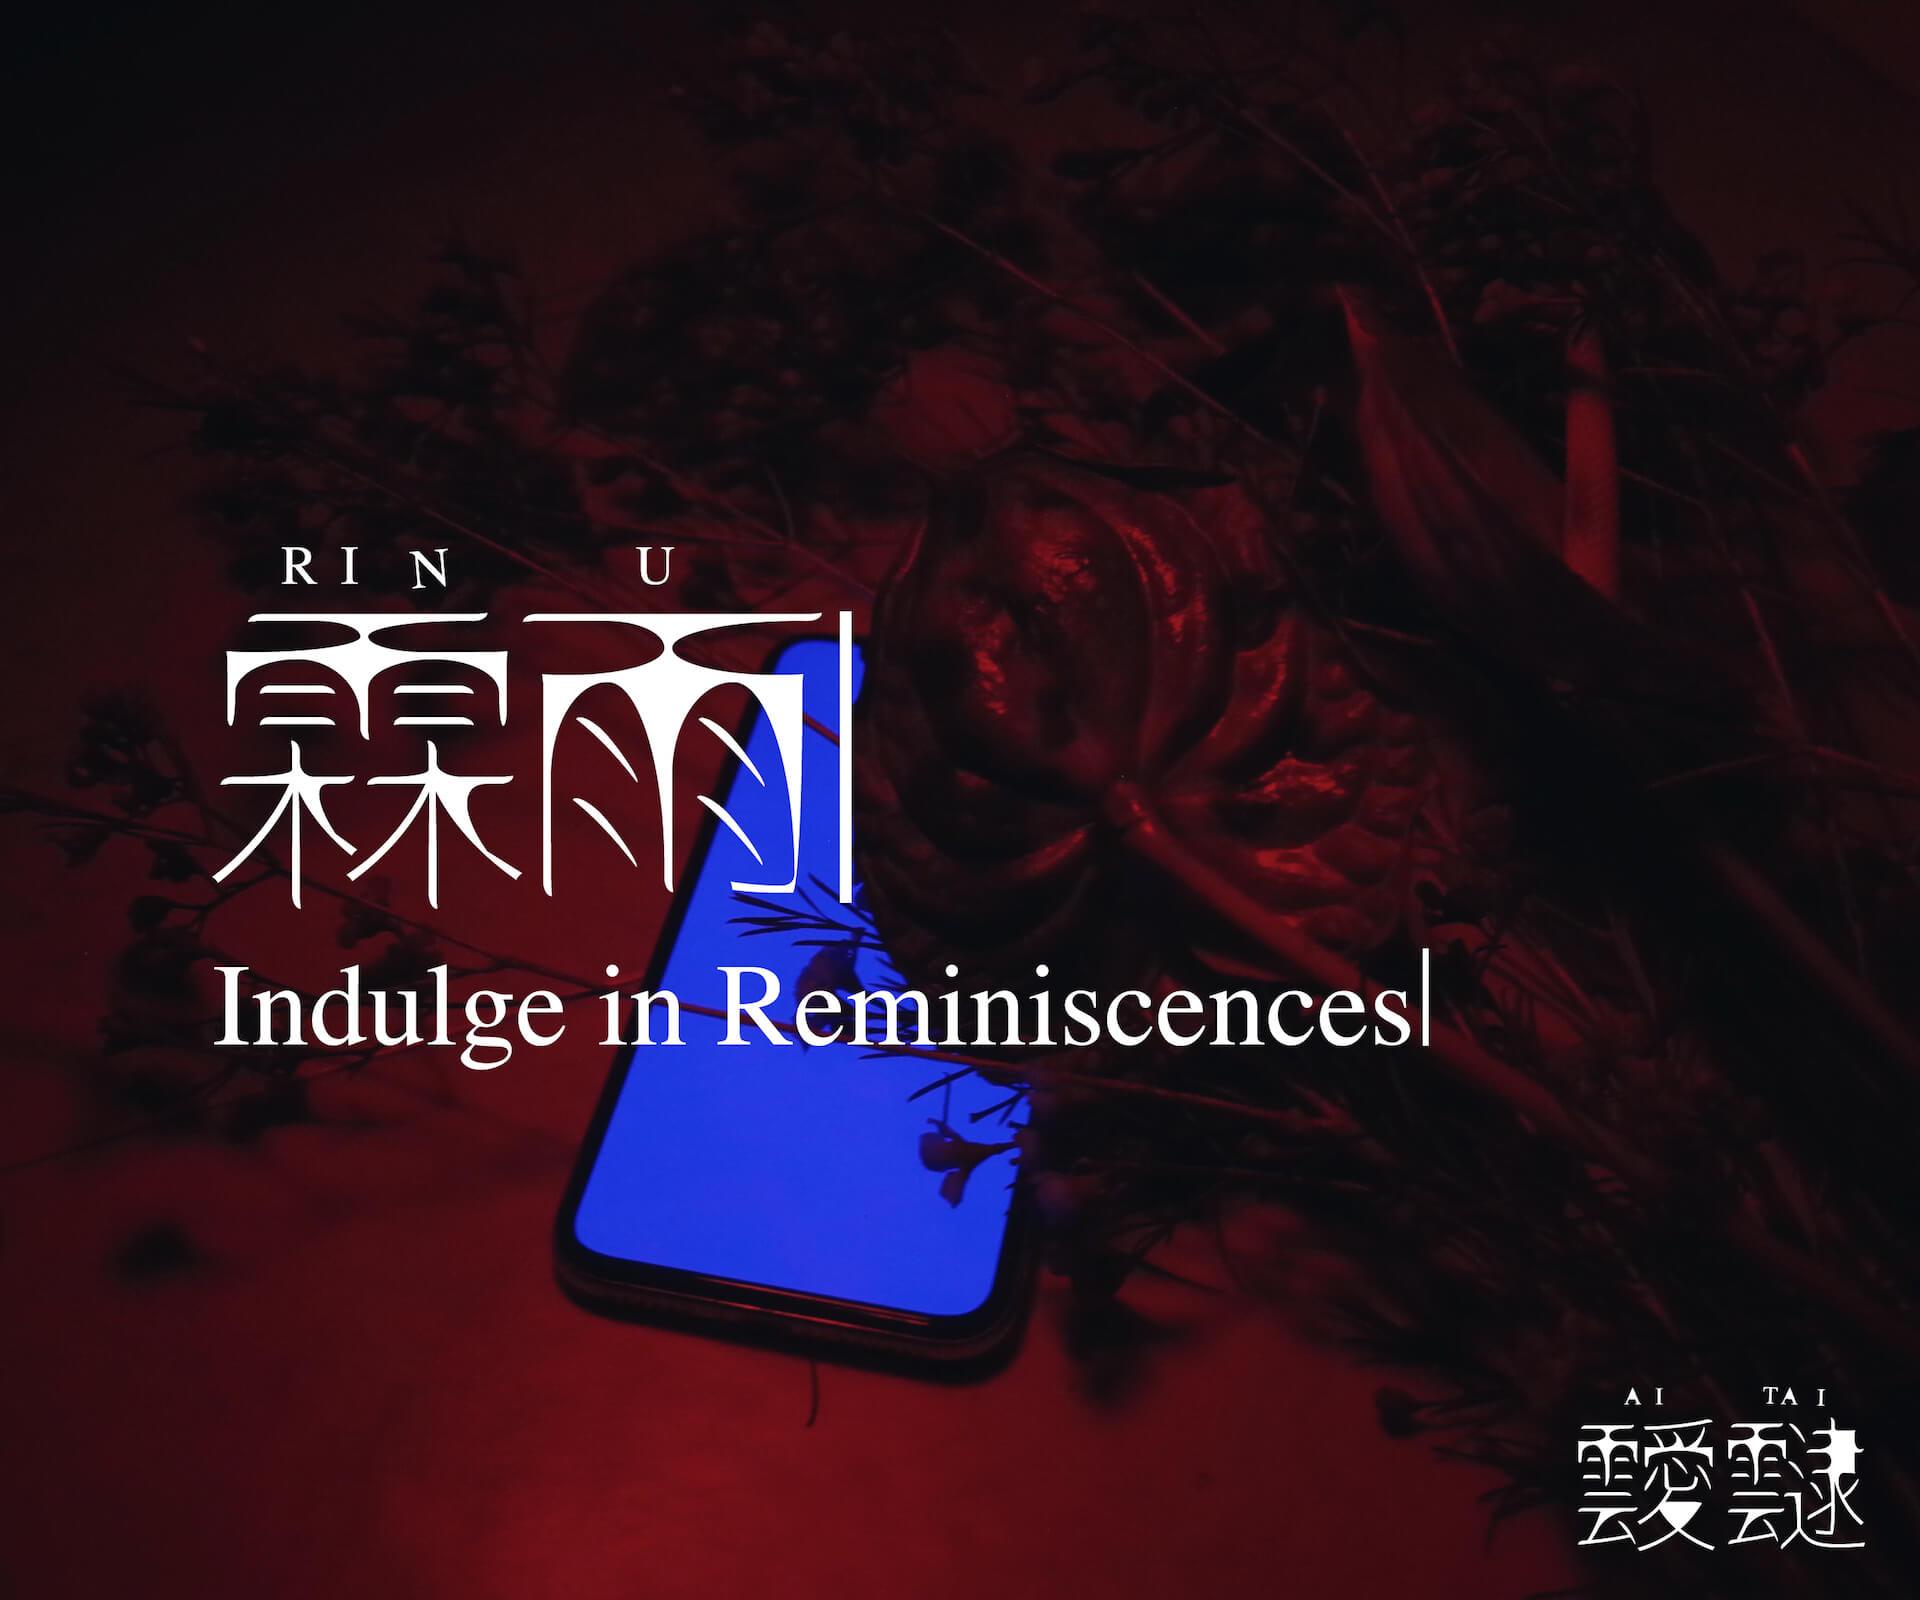 Seiho、<ニュイ・ブランシュKYOTO2019>で〈靉靆〉展示作品『霖雨-Indulge in Reminiscences-』発表決定 art191003_seiho_rinu_main